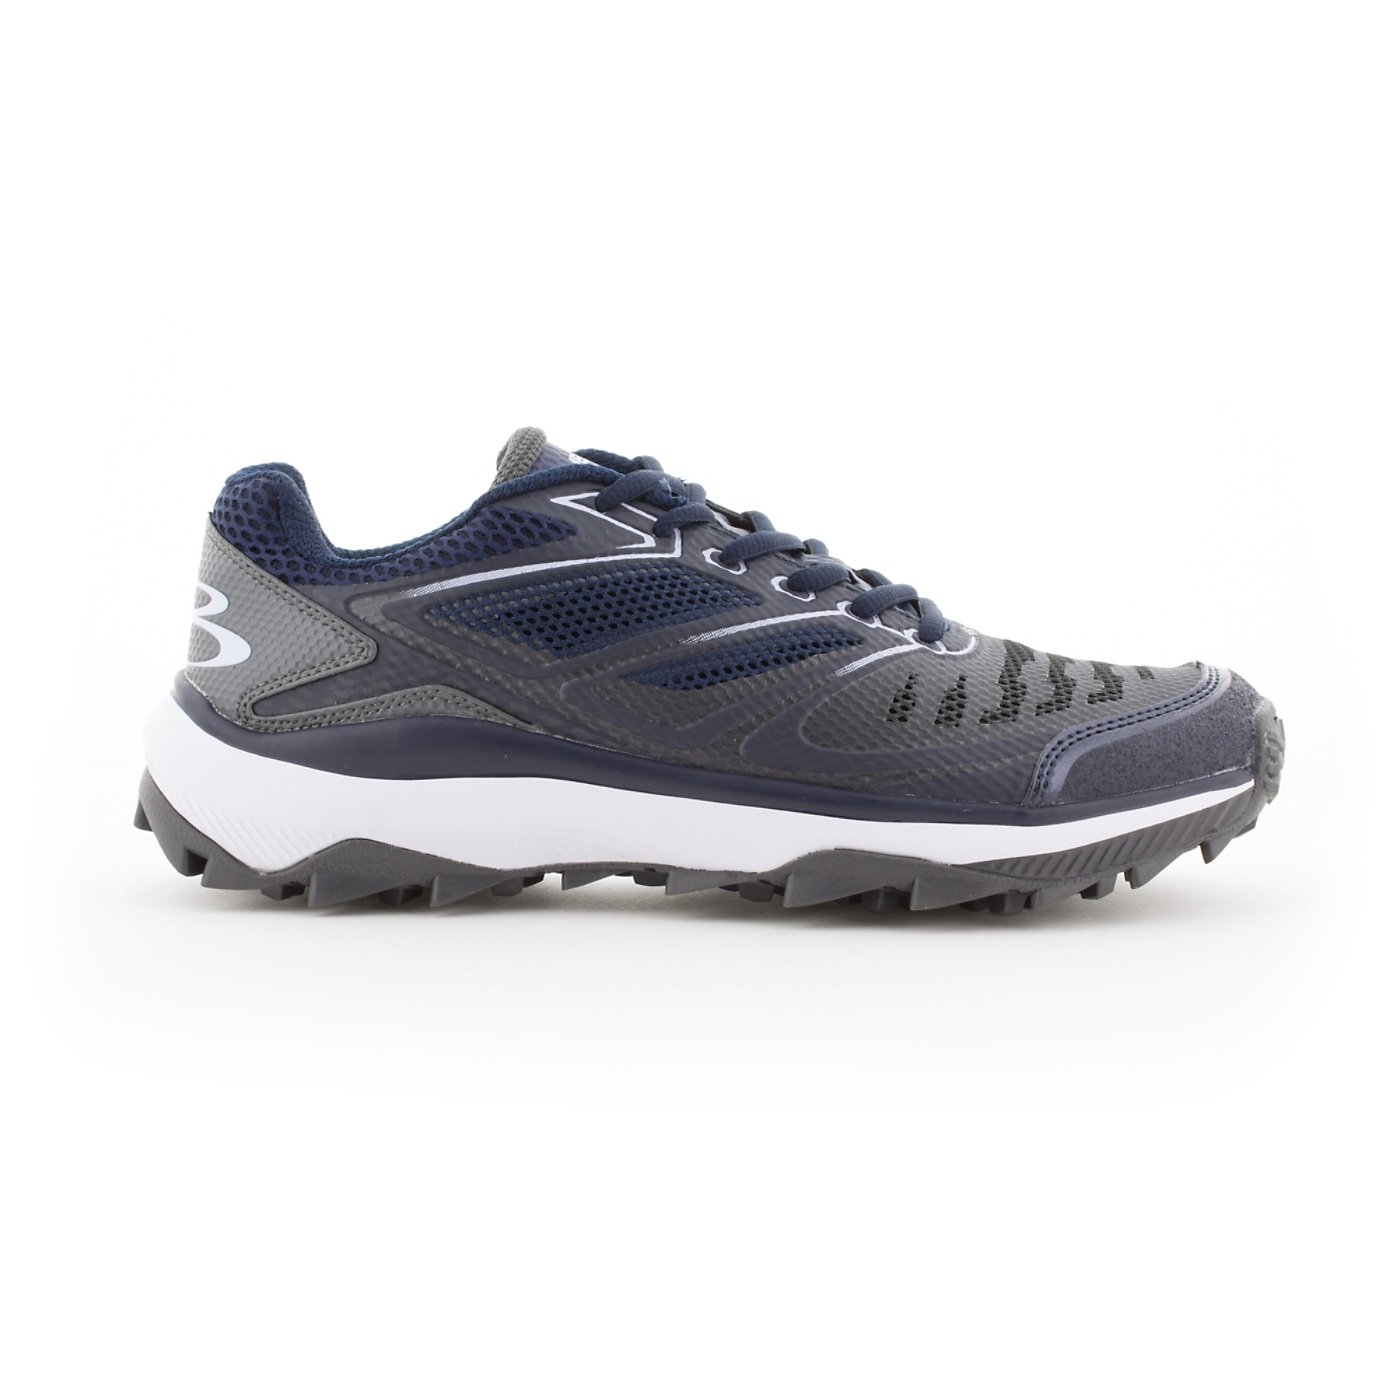 BoombahメンズTurbine Turf Shoes – 20カラーオプション – 複数のサイズ B076JRSZ2D 12|ネイビー/チャコール ネイビー/チャコール 12